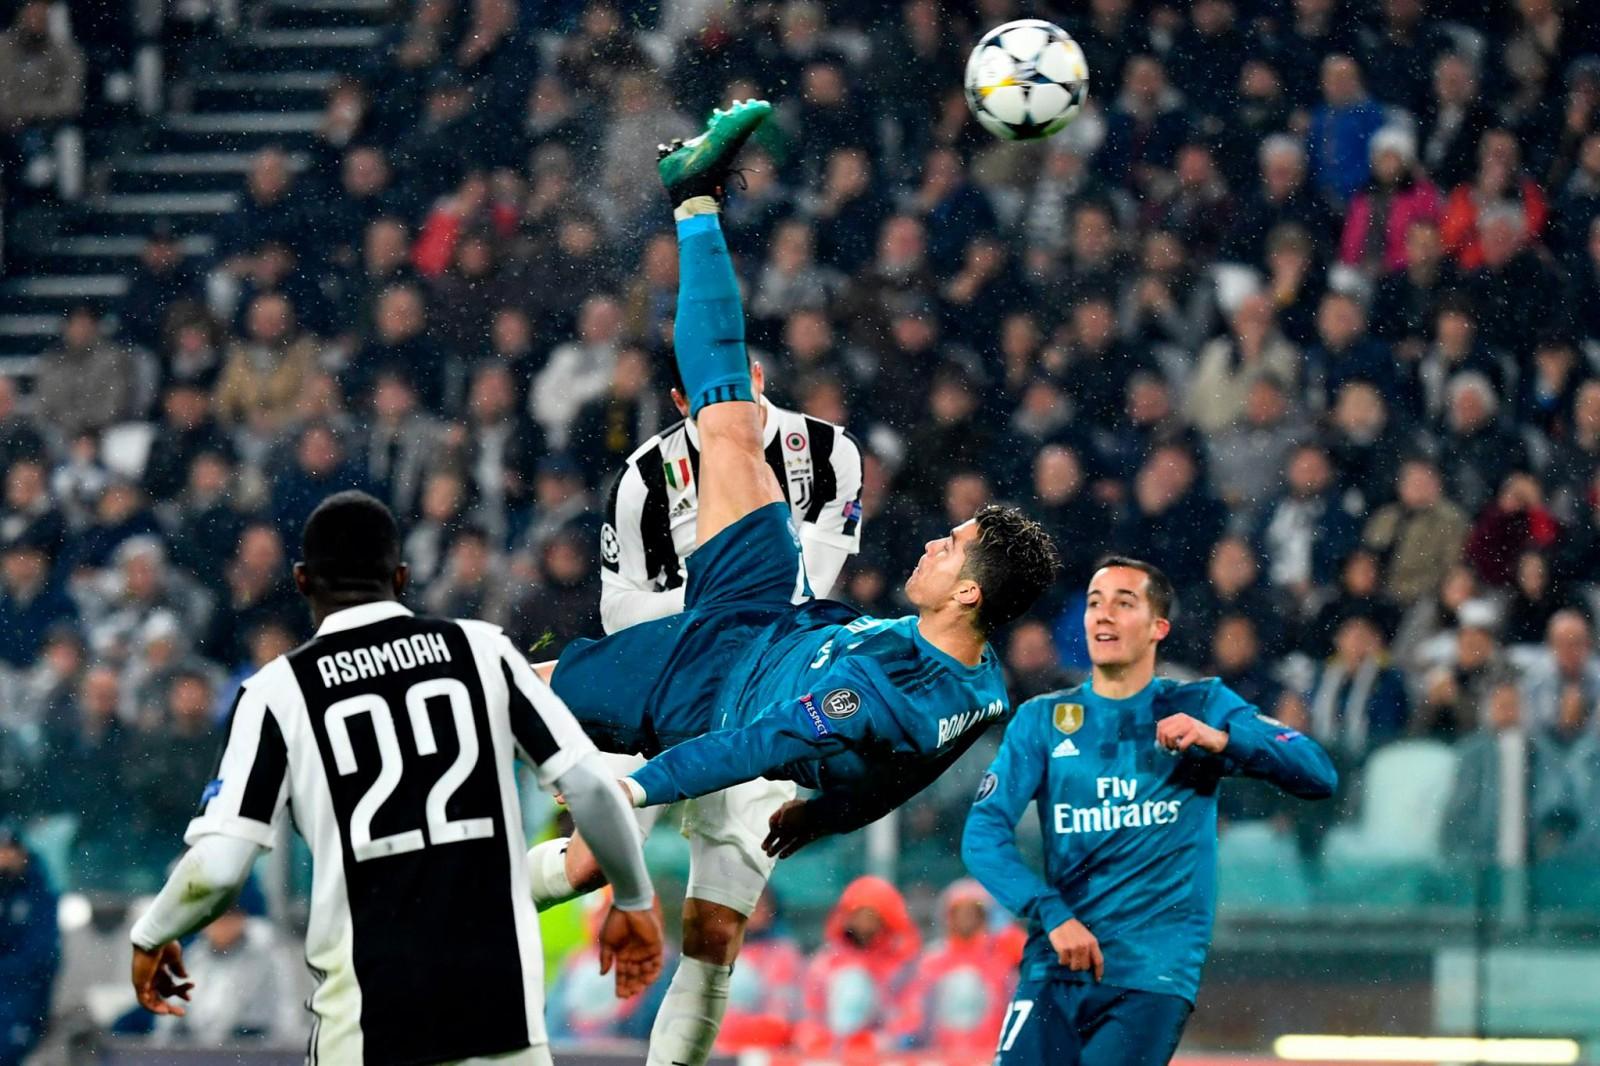 Juventus 0-3 Real Madrid: Portughezul Cristiano Ronaldo a marcat un gol fabulos la Torino